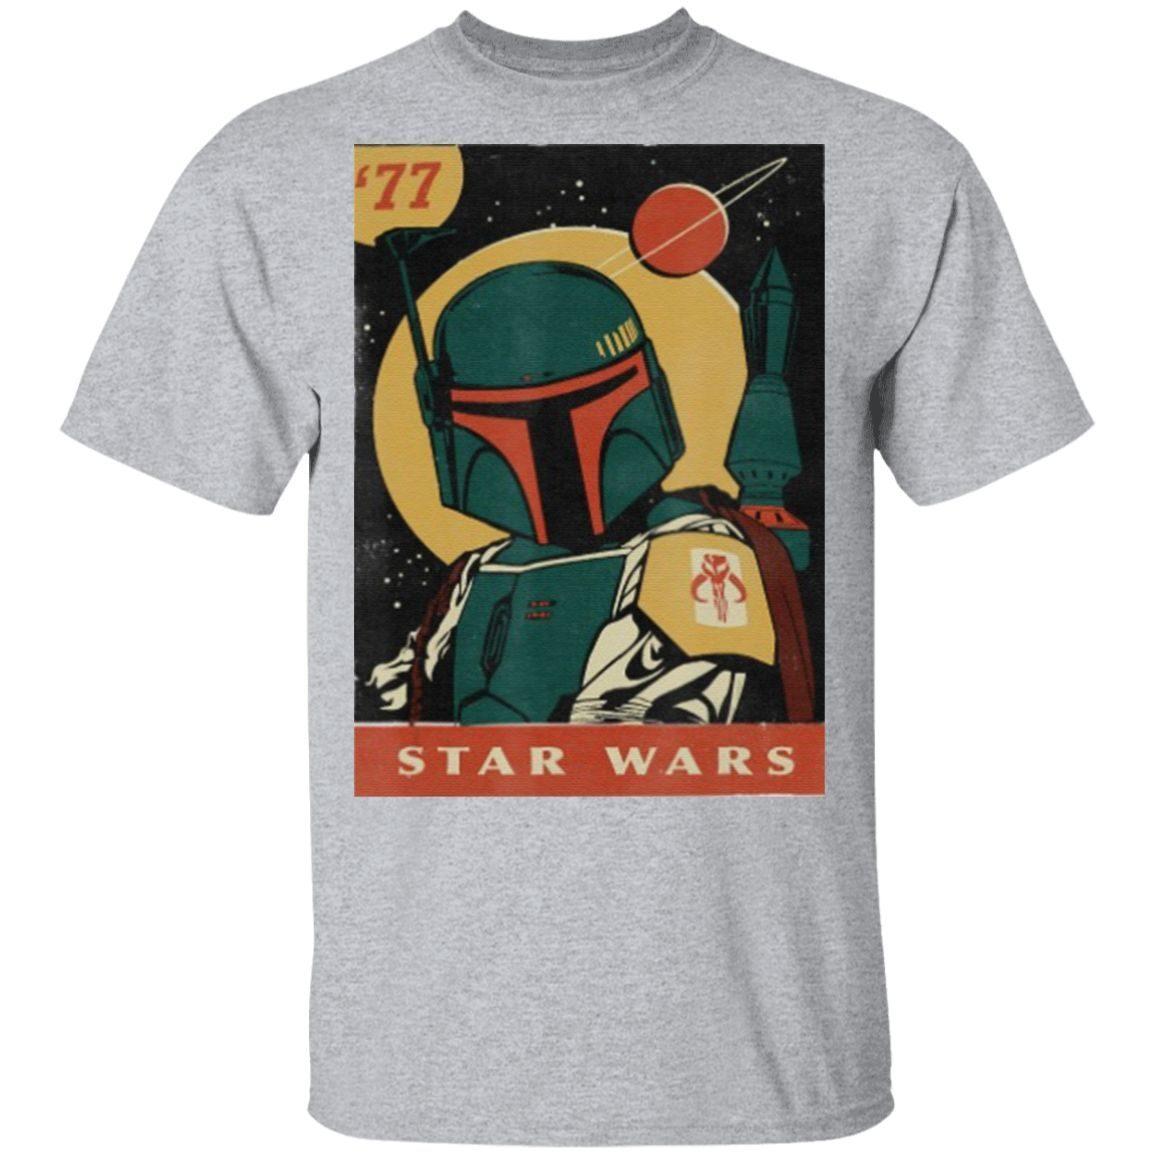 Star Wars Boba Fett Vintage Trading Card '77 T Shirt